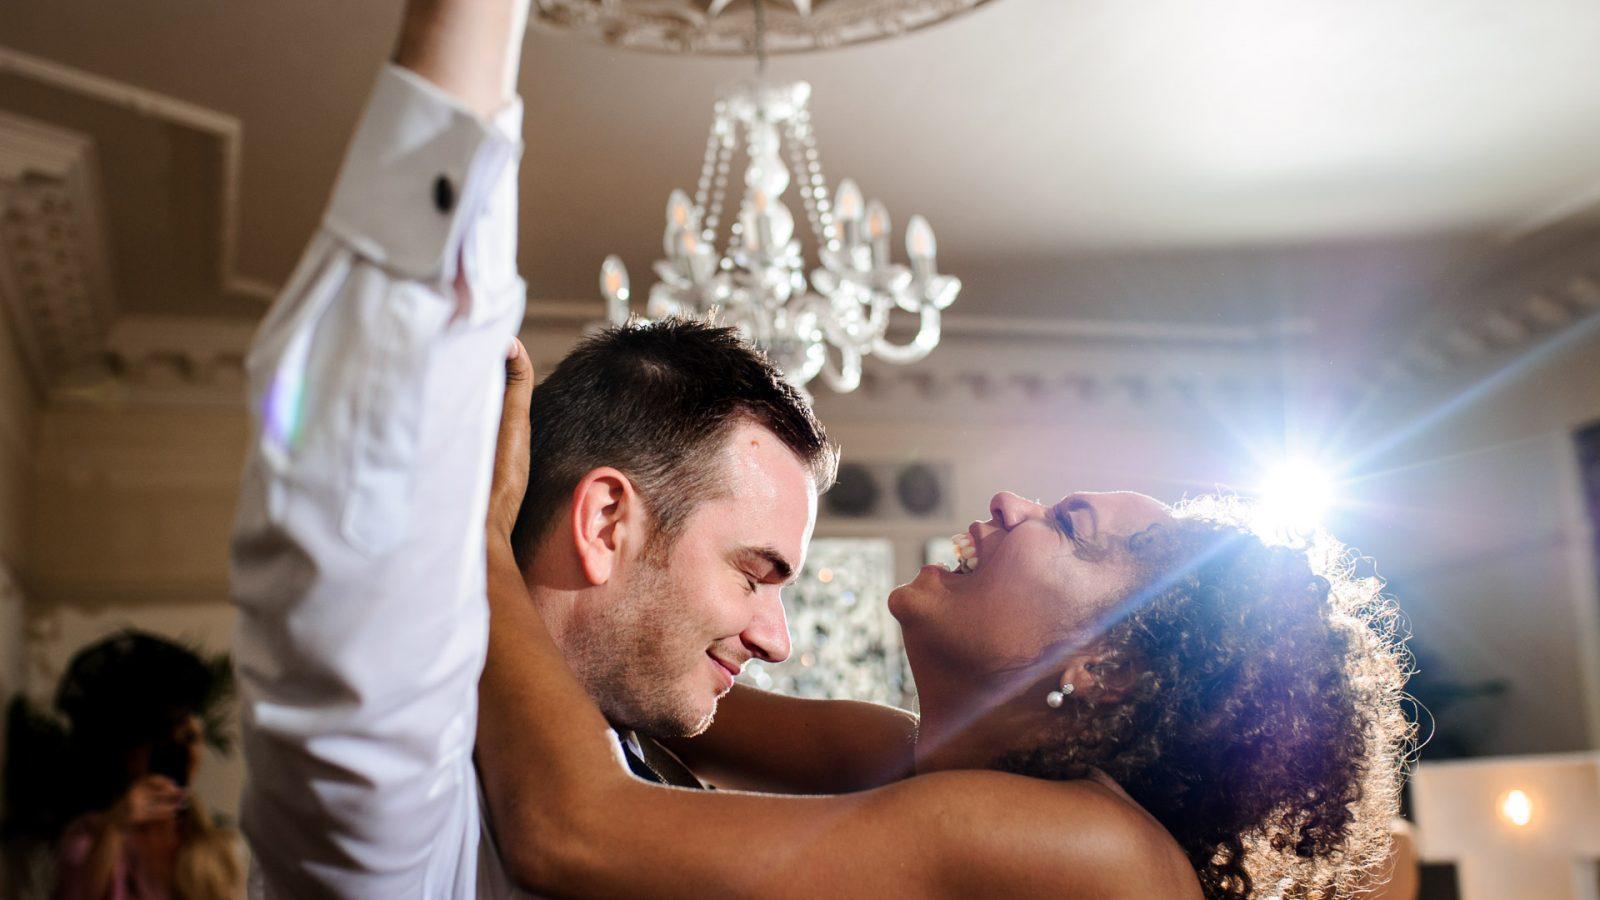 best-wedding-photos-2017-kimberley-and-joseph-in-love-first-dance